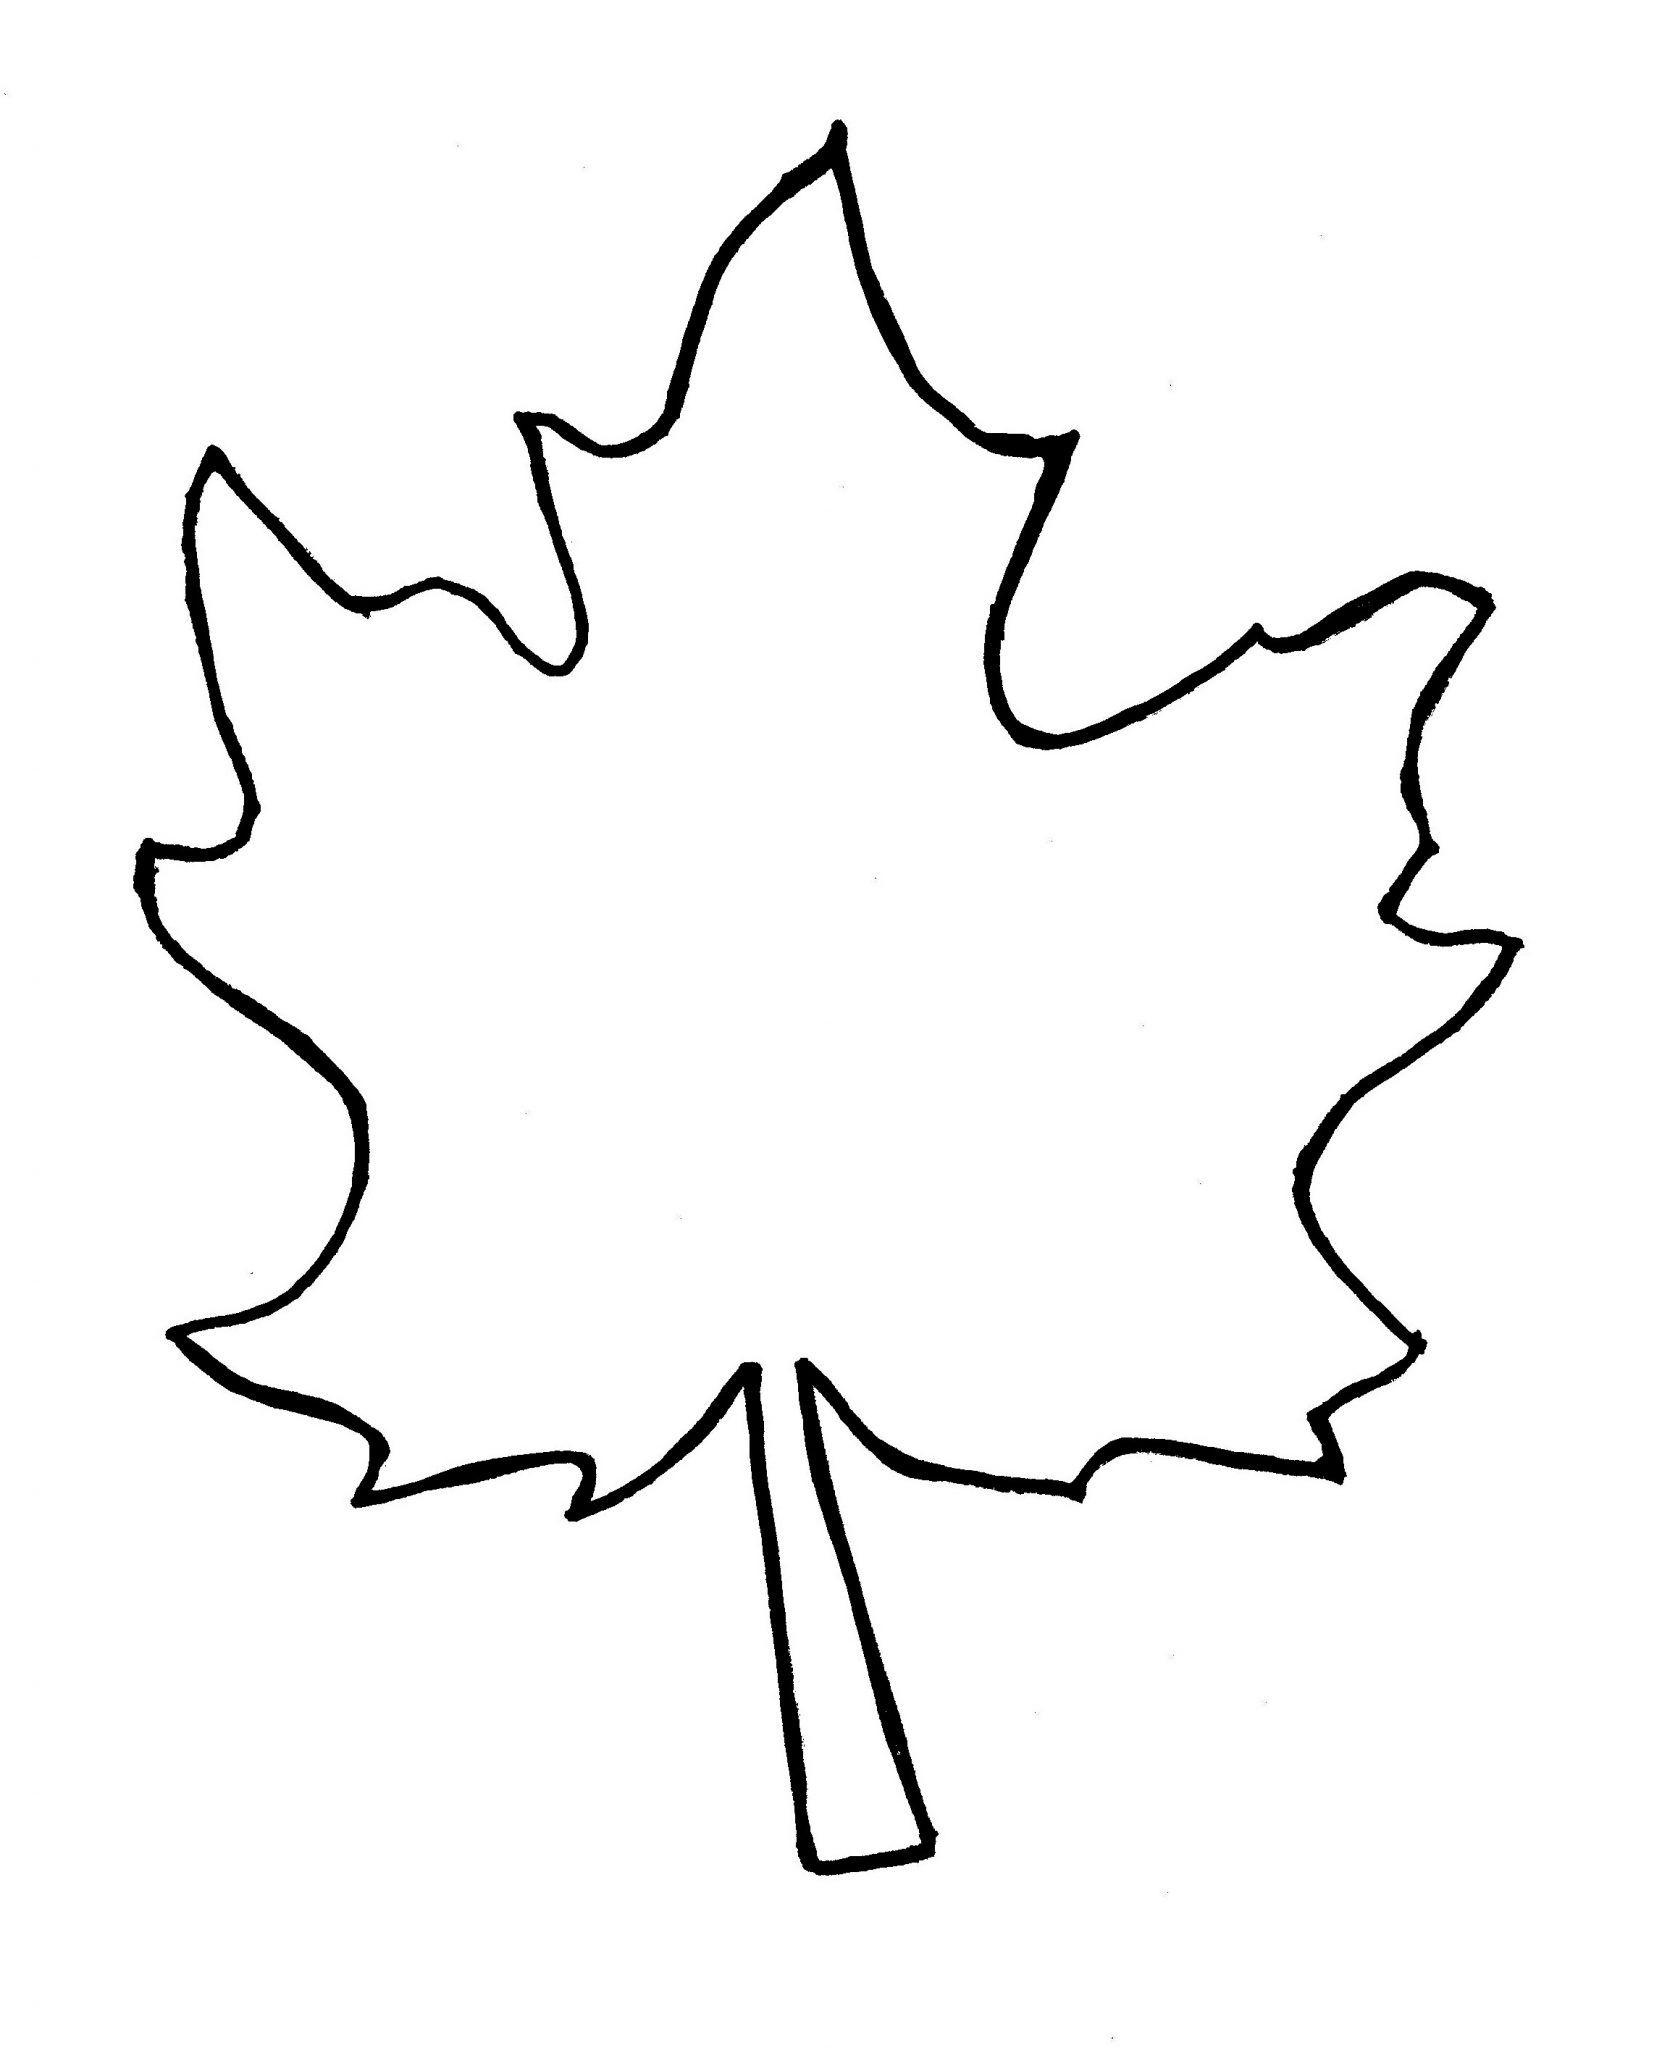 Large Leaf Template in 2020 | Leaf template, Leaf template ...